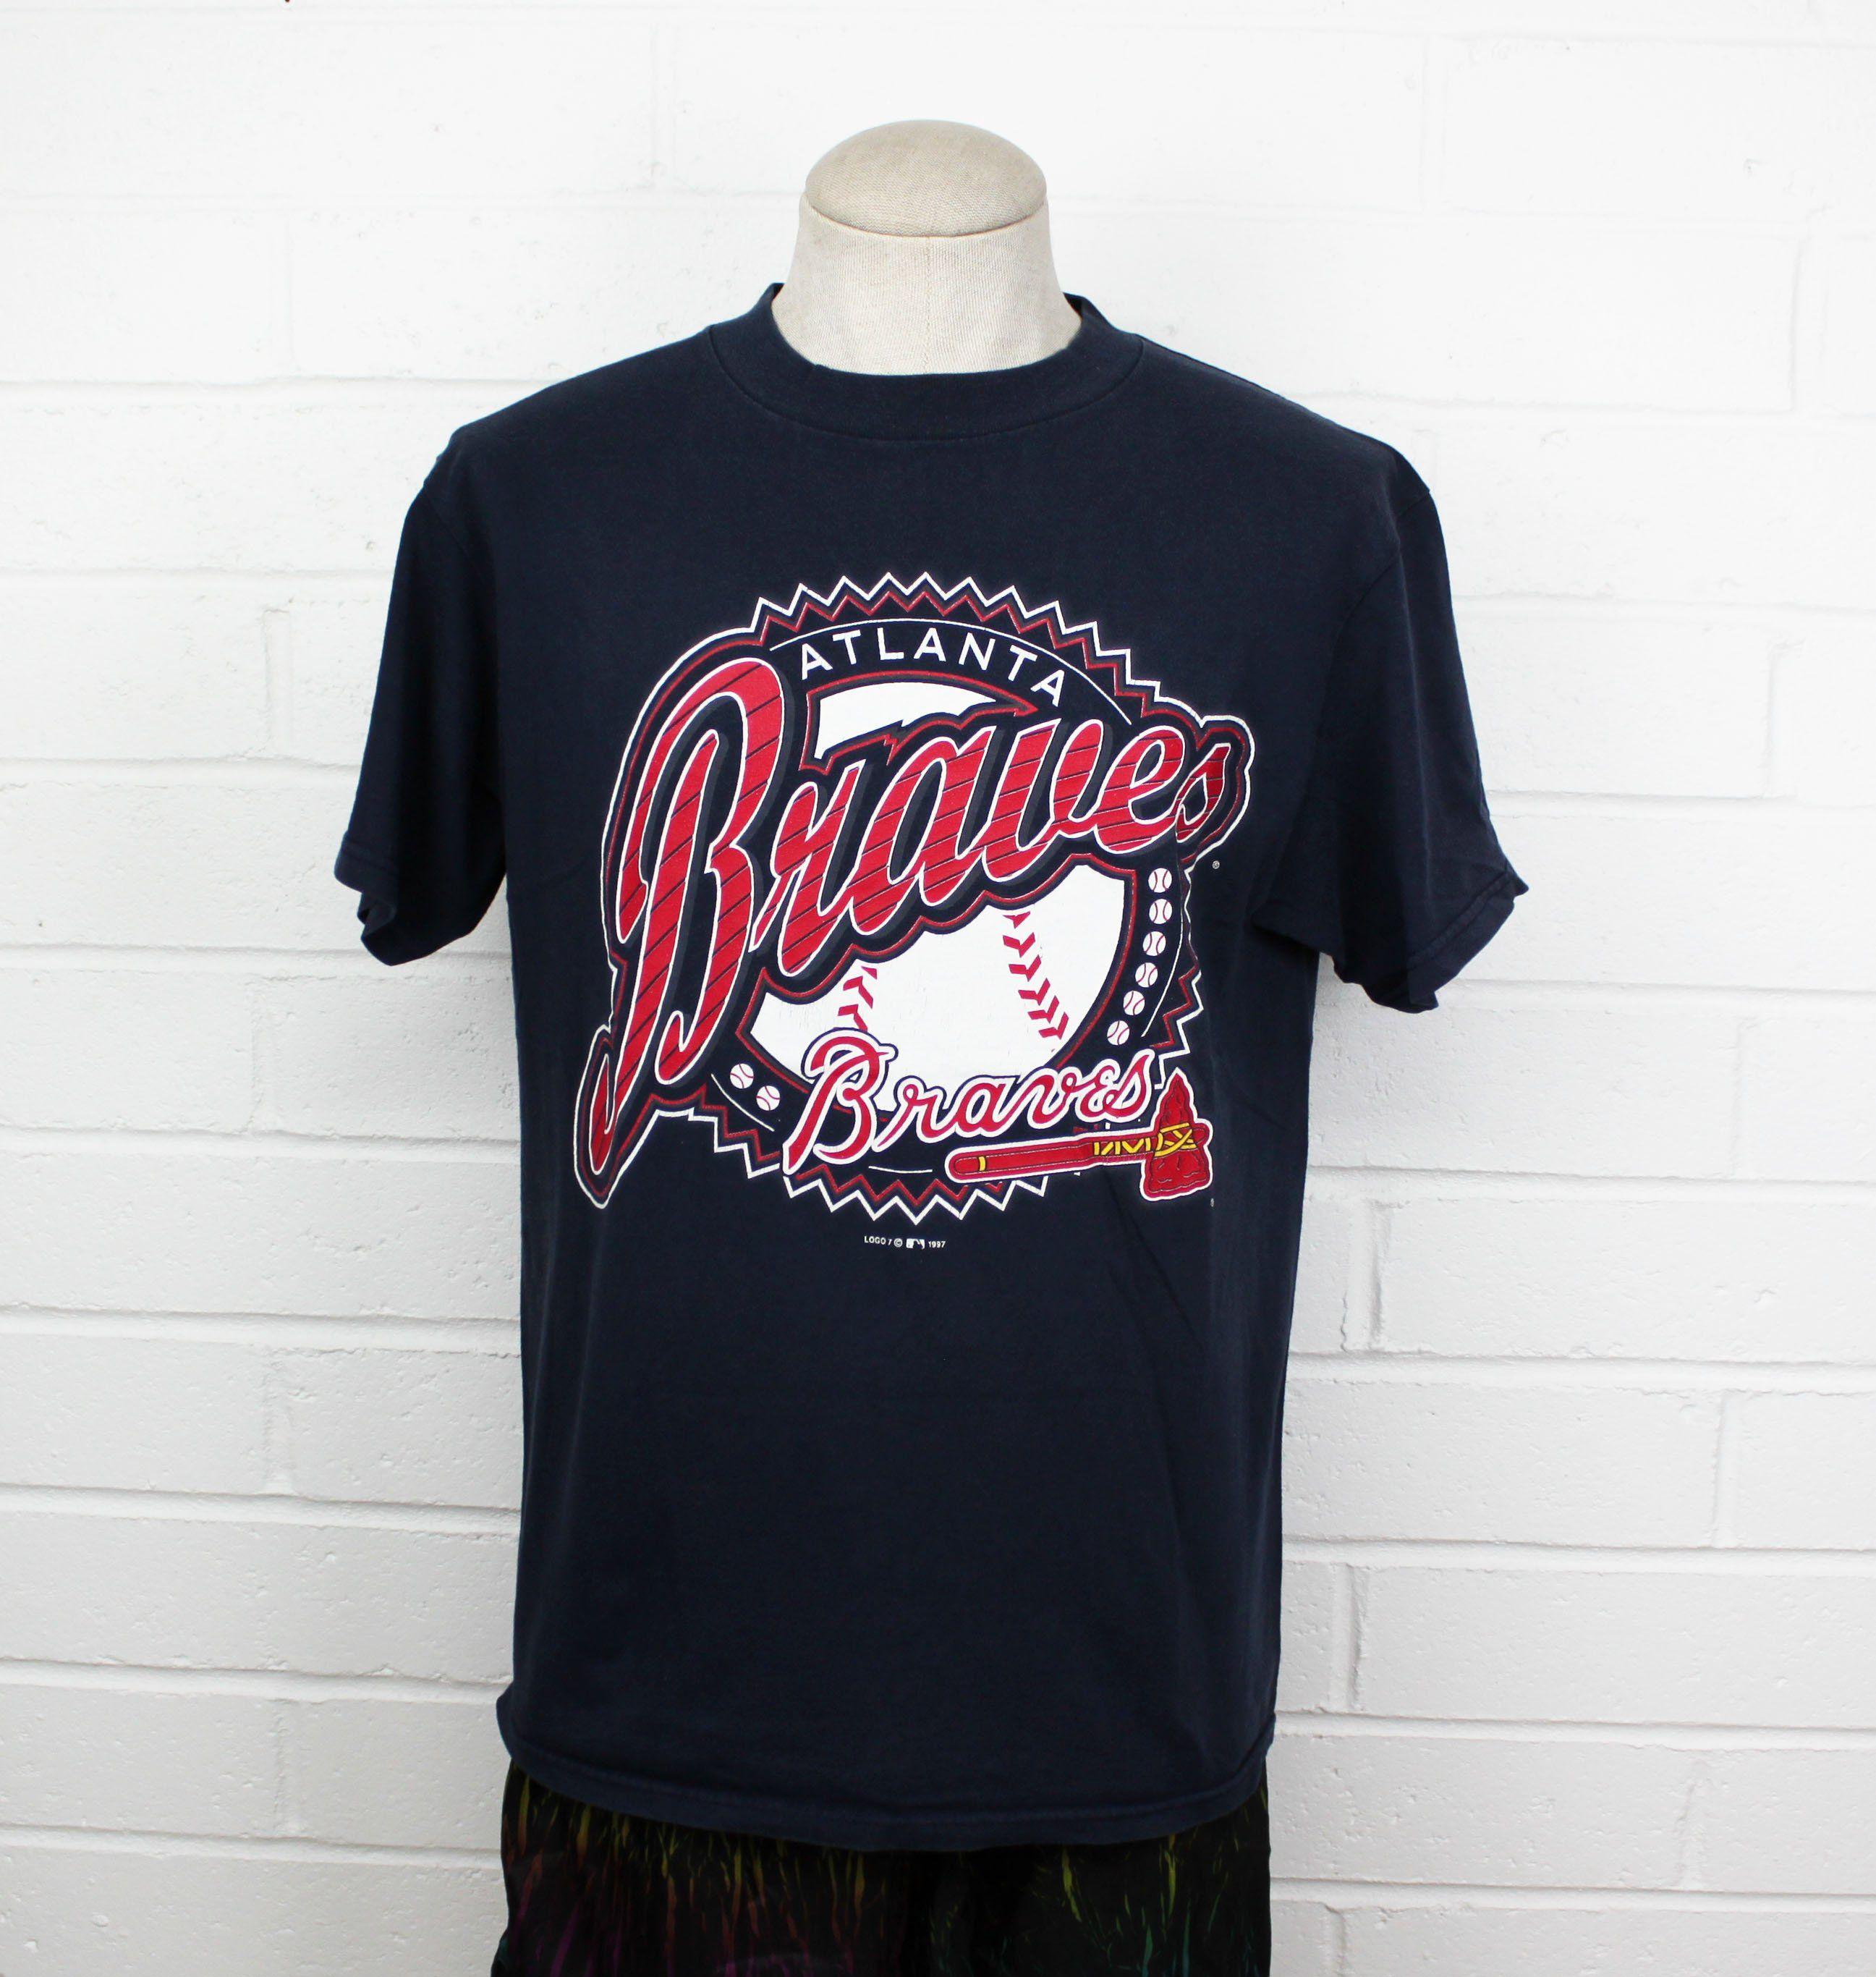 Vintage 90s Atlanta Braves Shirt Large Mlb Baseball Retro Tee T Shirt By Nack4vintageshop On Etsy Atlanta Braves Shirt